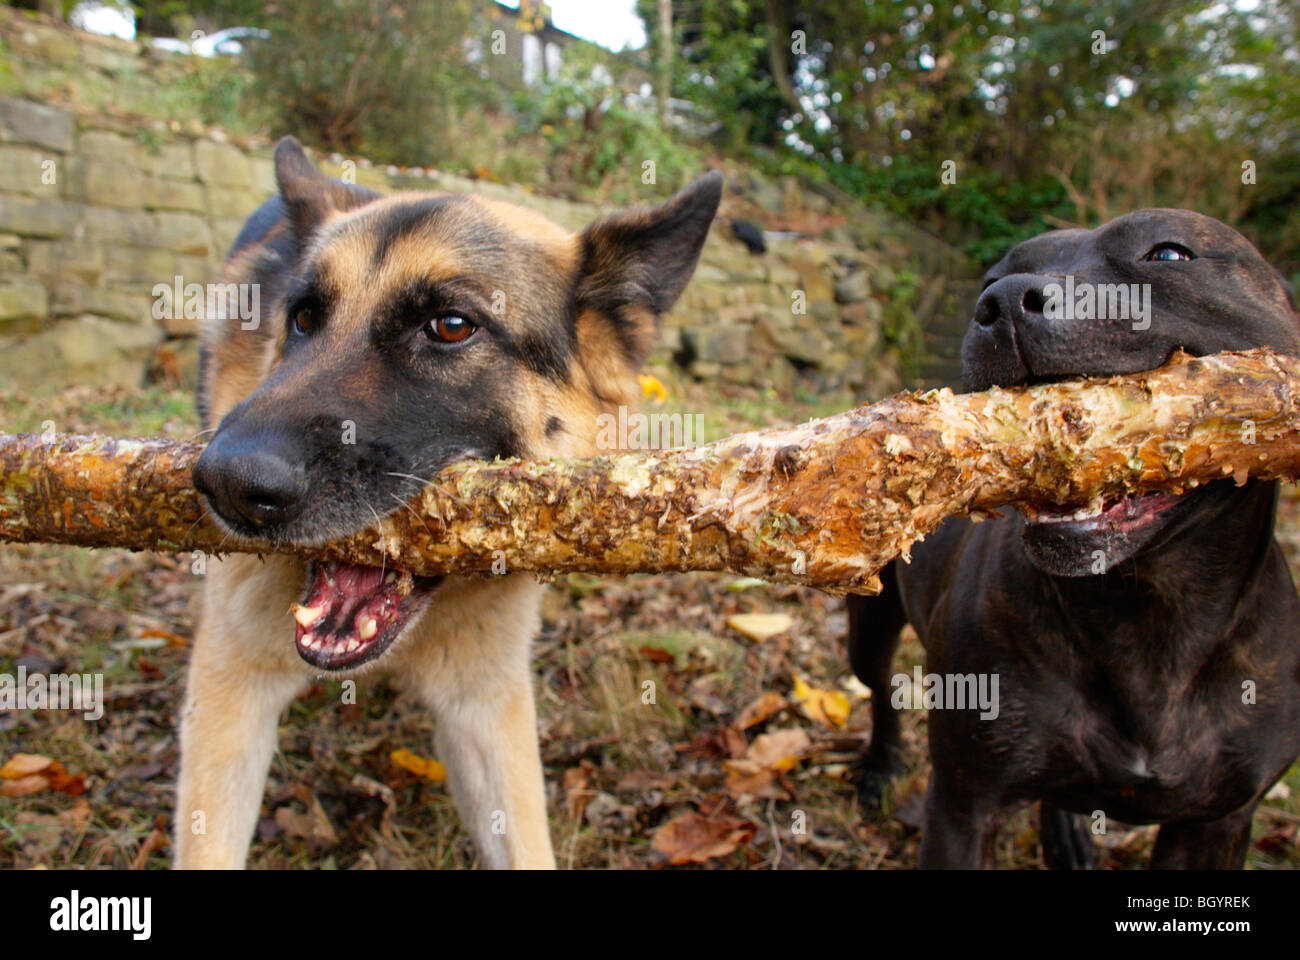 Bruno & Kayleigh - Stock Image